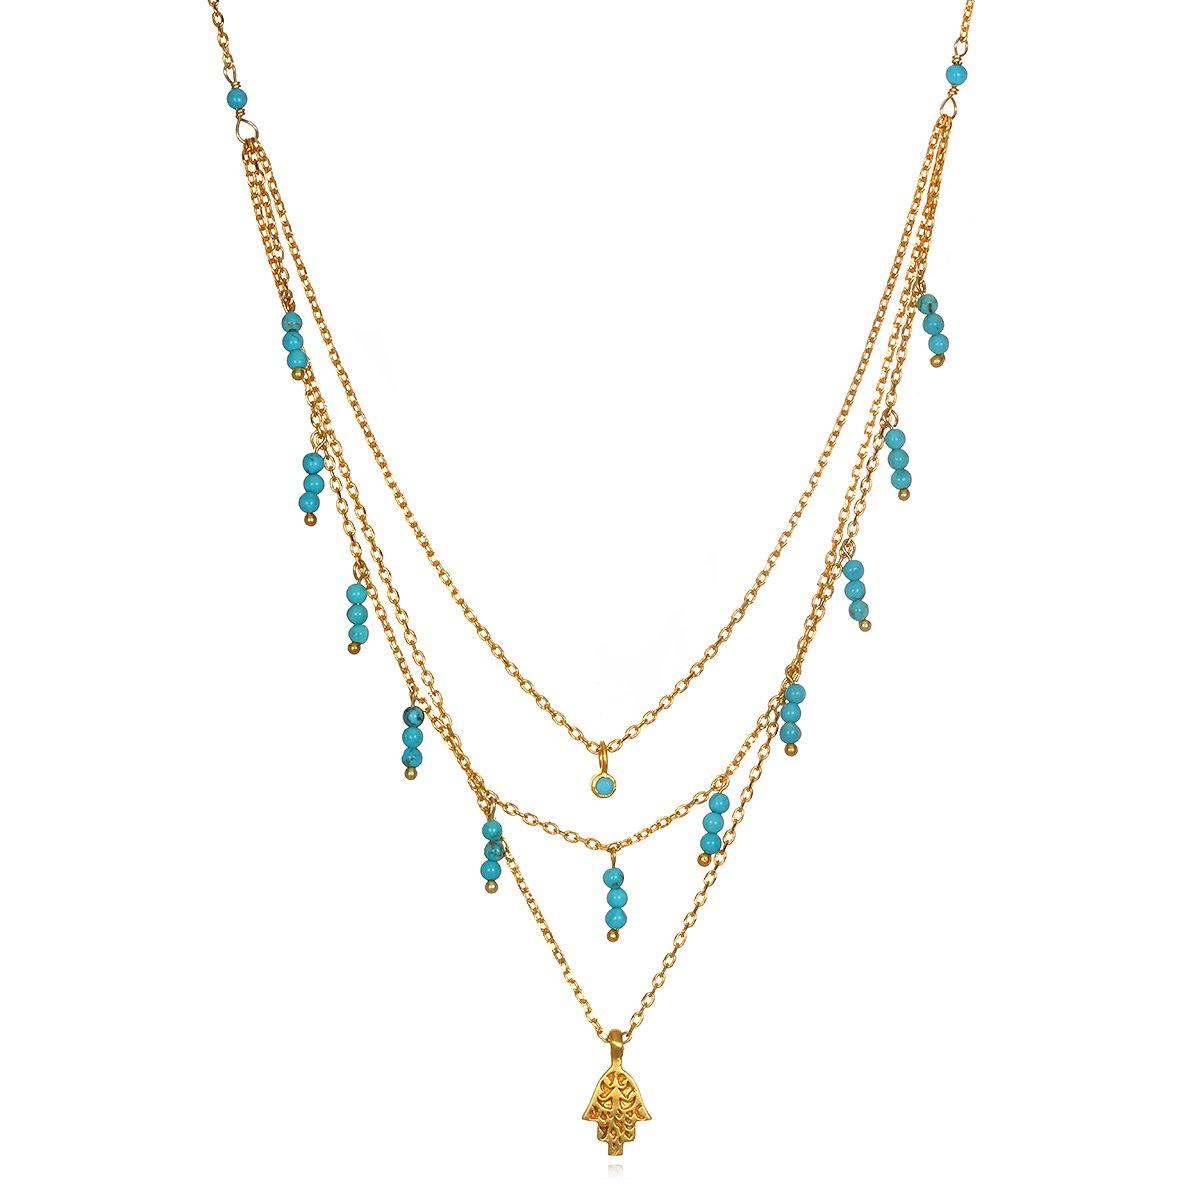 Satya Jewelry Turquoise Gold Plate Hamsa Triple Chain Pendant Necklace, 18'' by Satya Jewelry